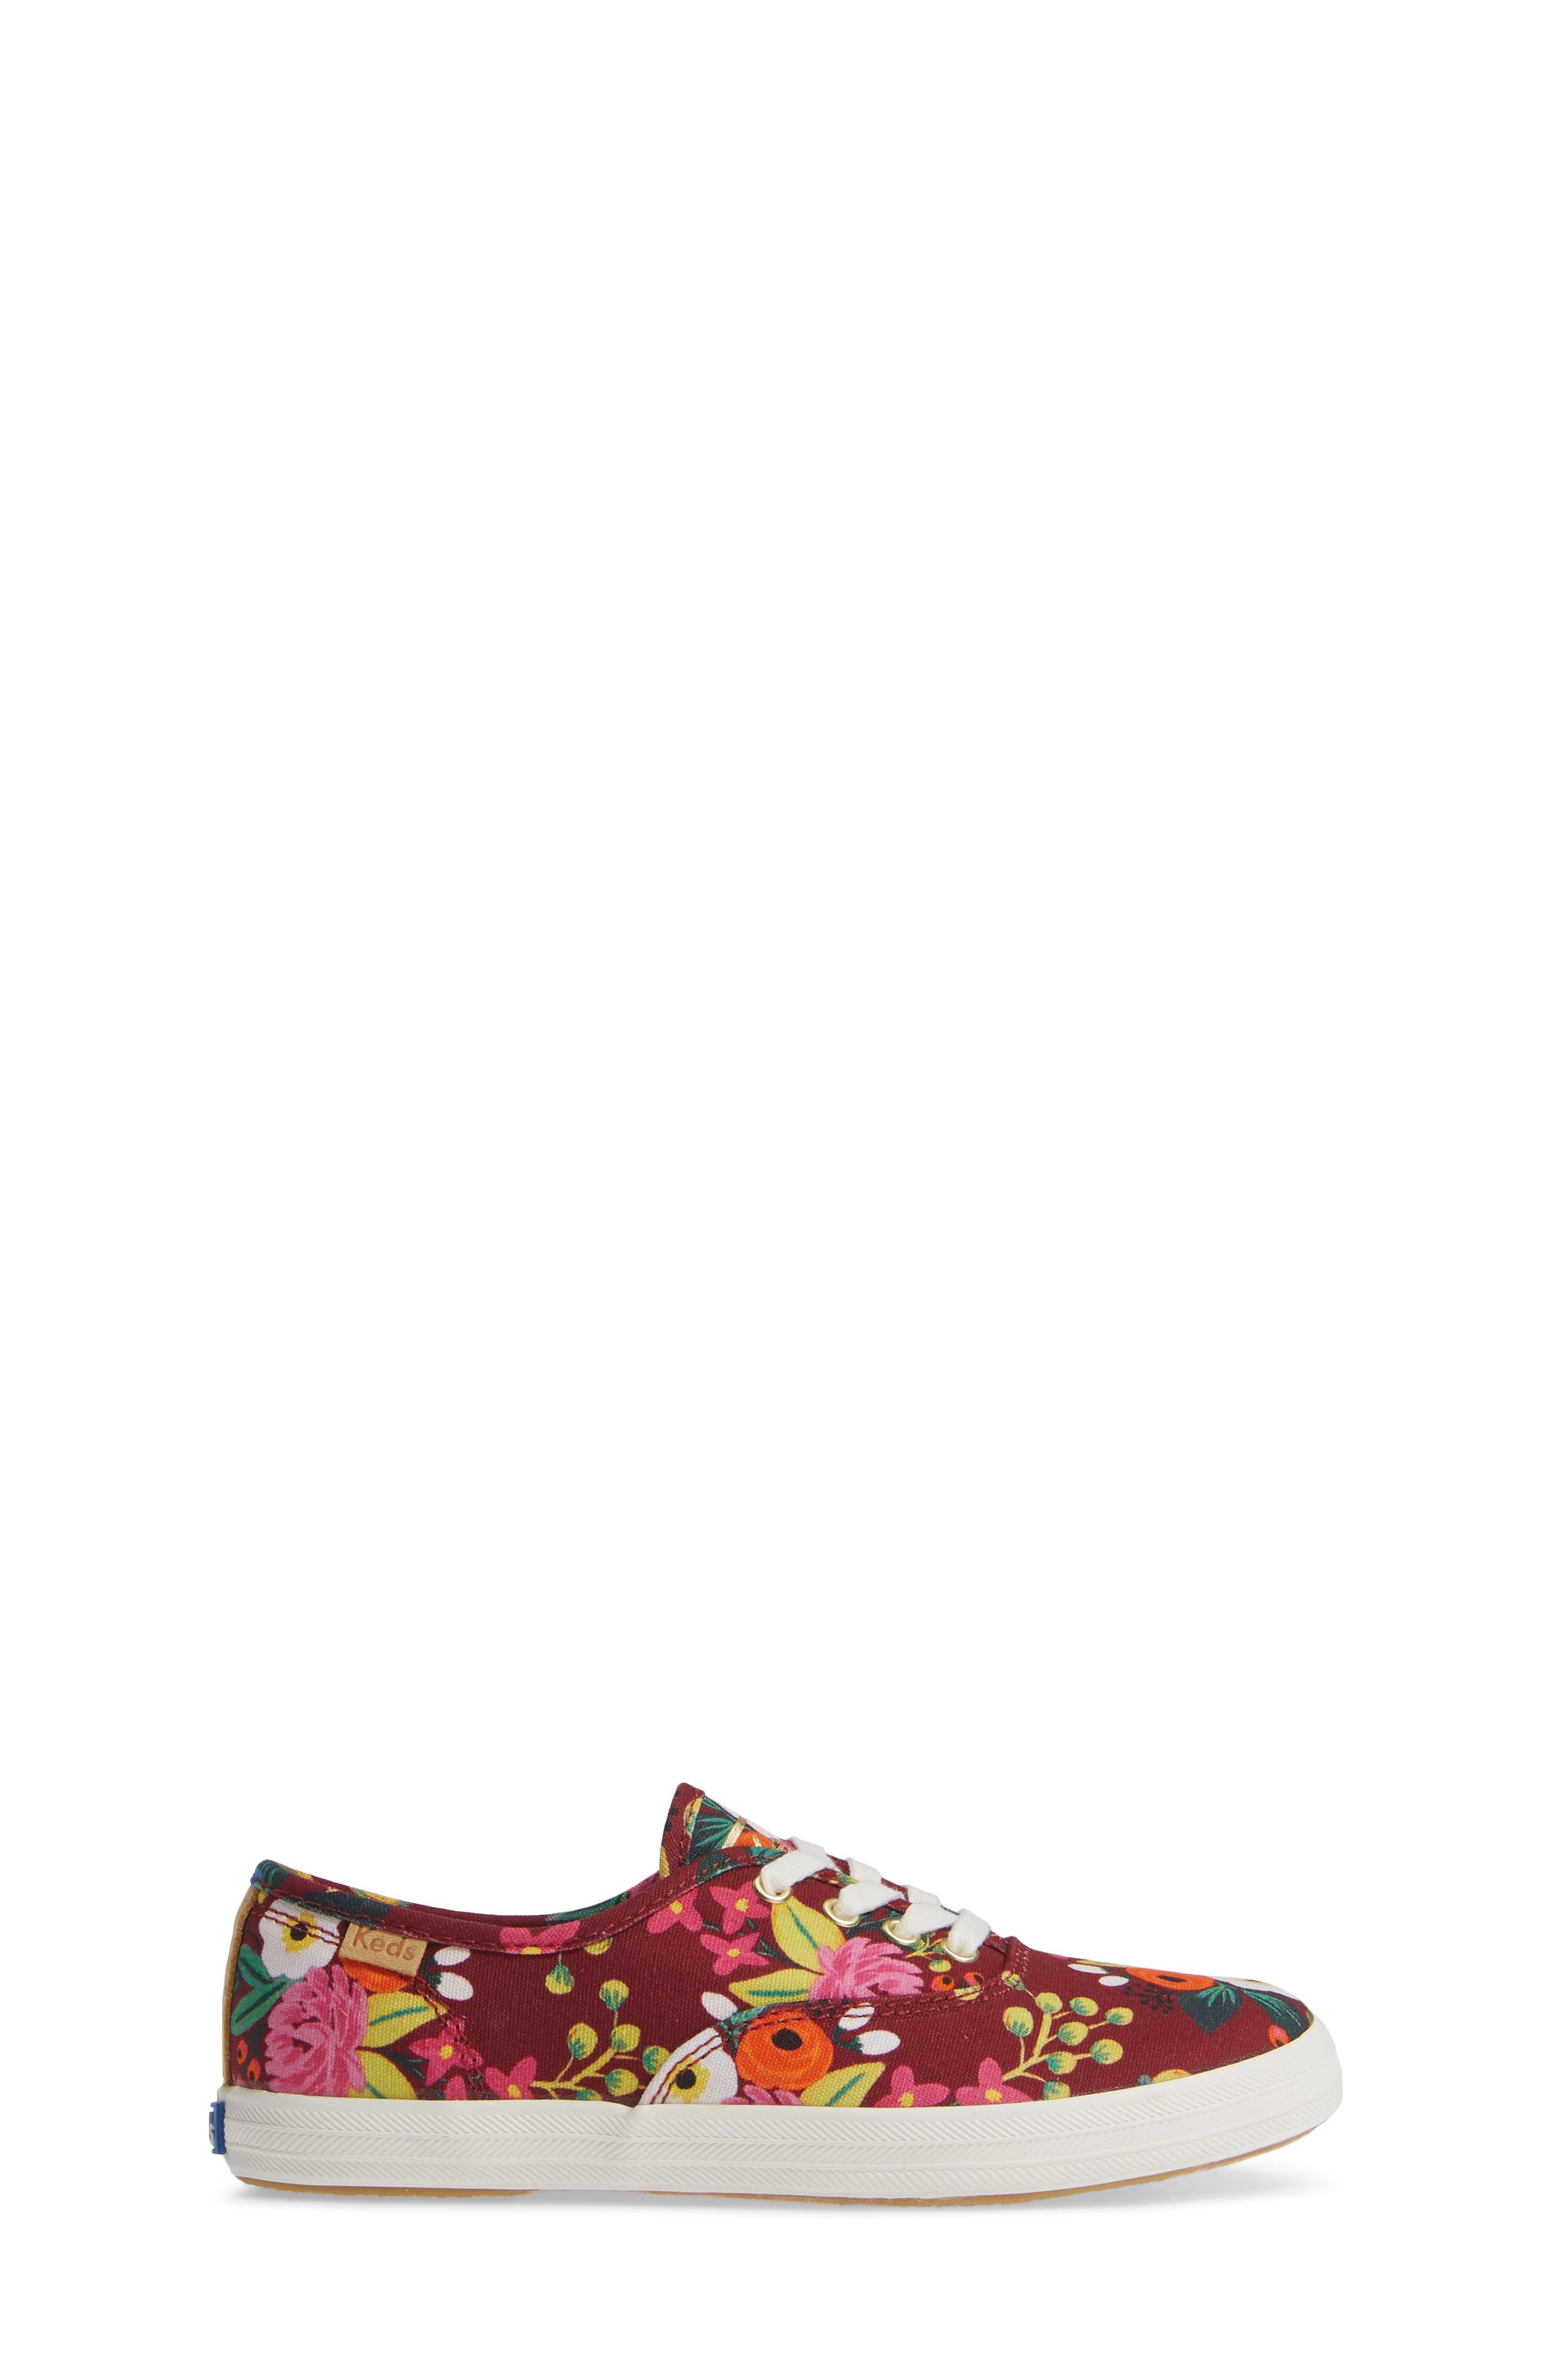 x Rifle Paper Co. Floral Print Champion Sneaker,                             Alternate thumbnail 3, color,                             VINTAGE BLOSSOM